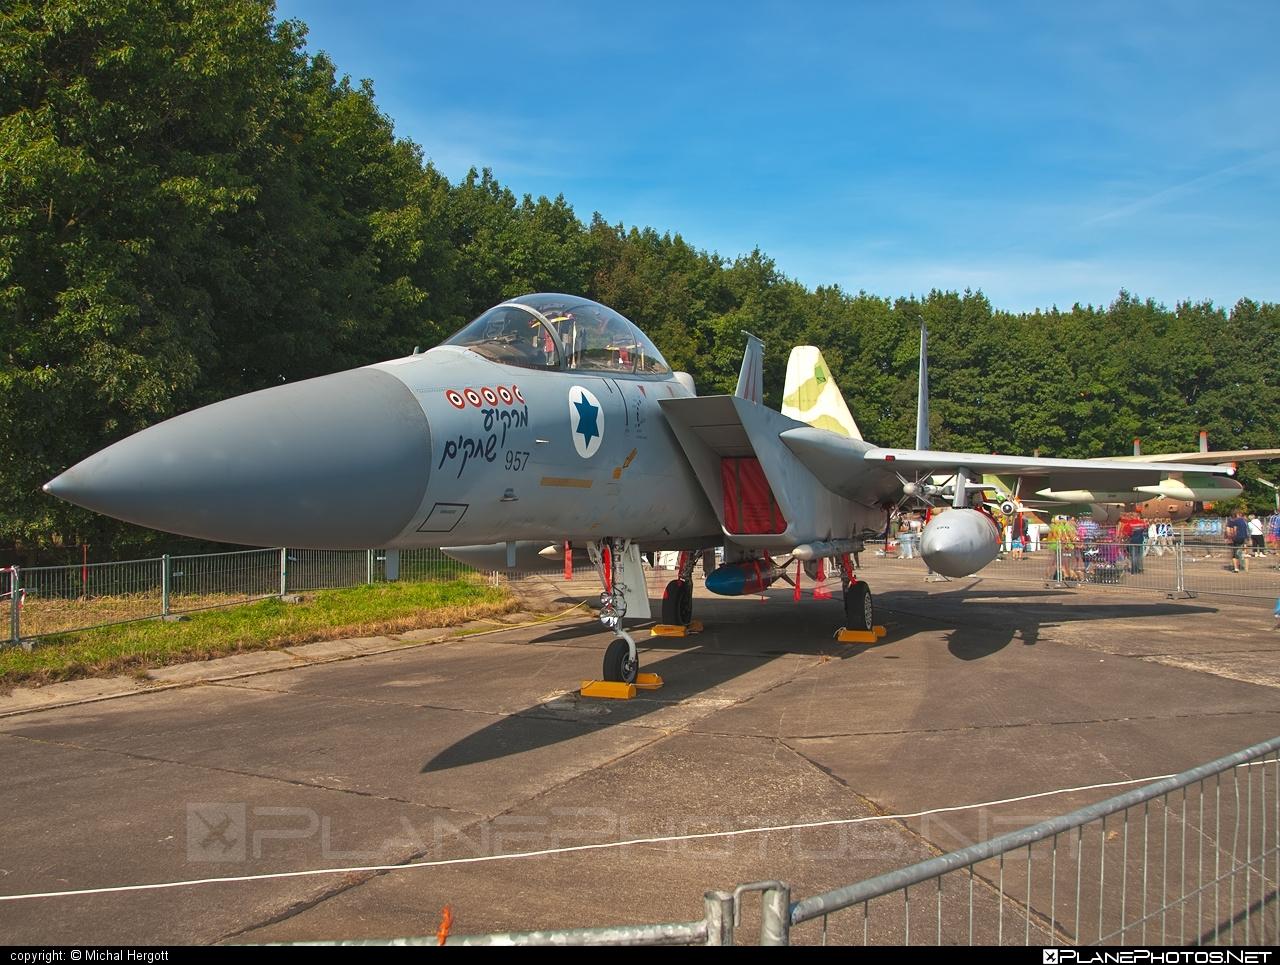 McDonnell Douglas F-15D Eagle - 957 operated by Zroa HaAvir VeHahalal (Israeli Air Force) #mcdonnelldouglas #natodays #natodays2011